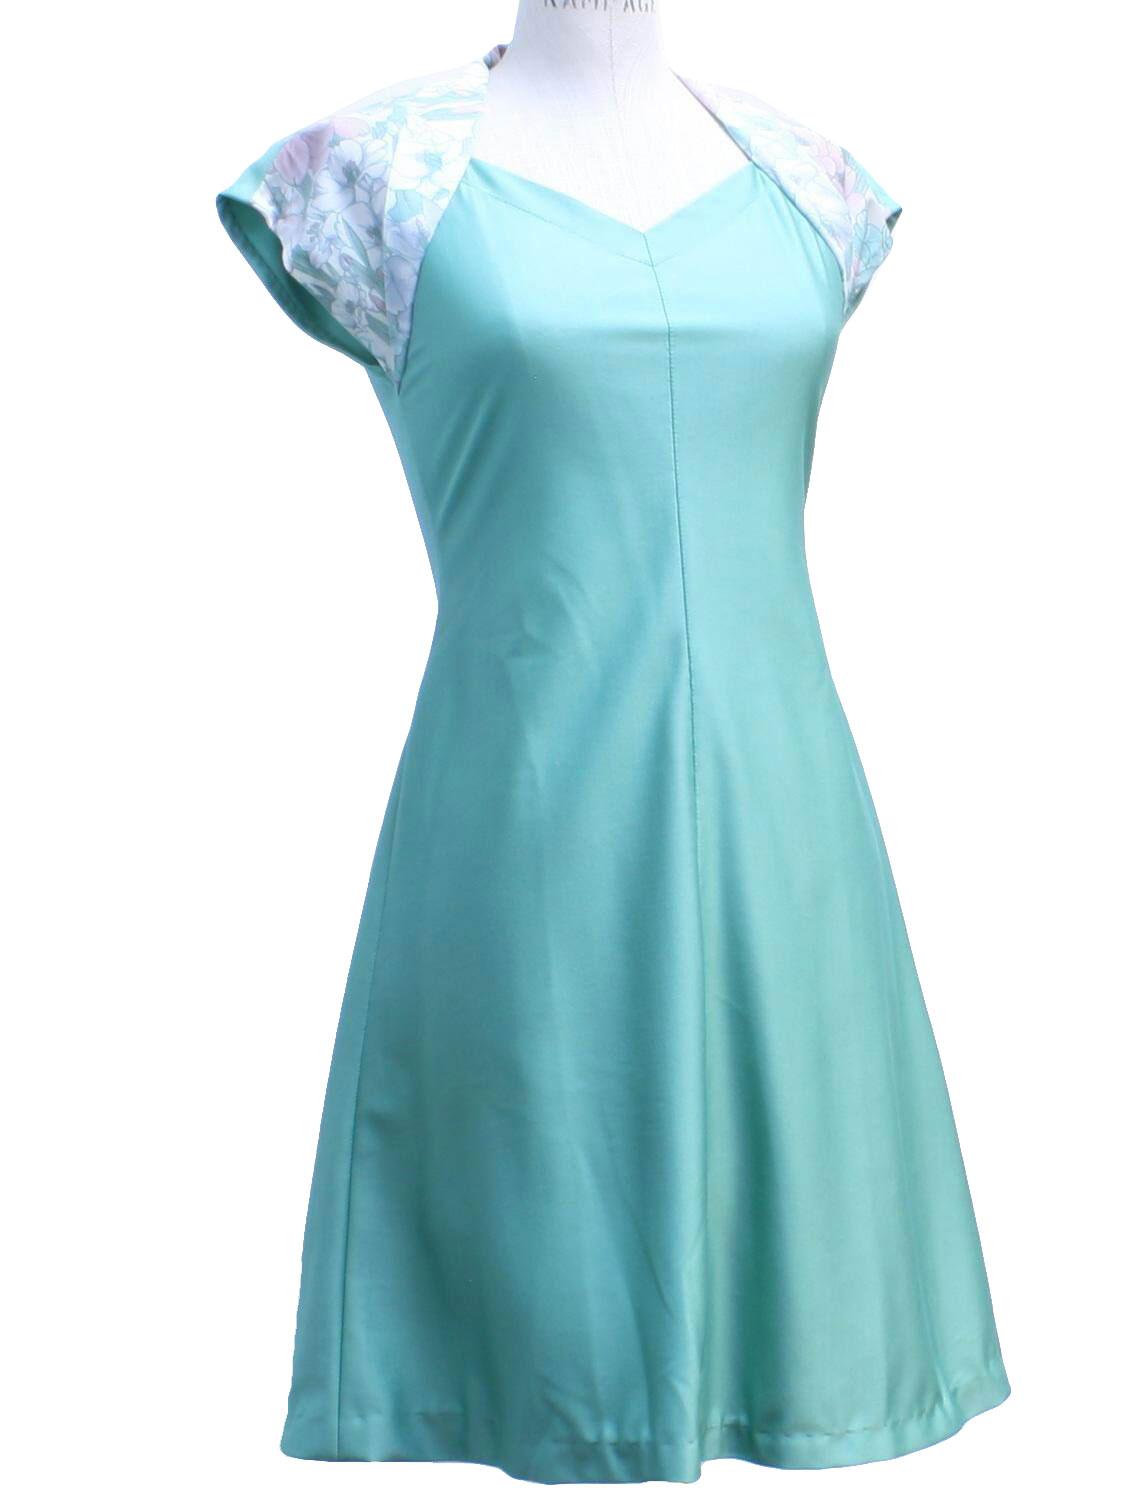 Related 1980s formal dresses 1970s dresses 1960s formal dresses